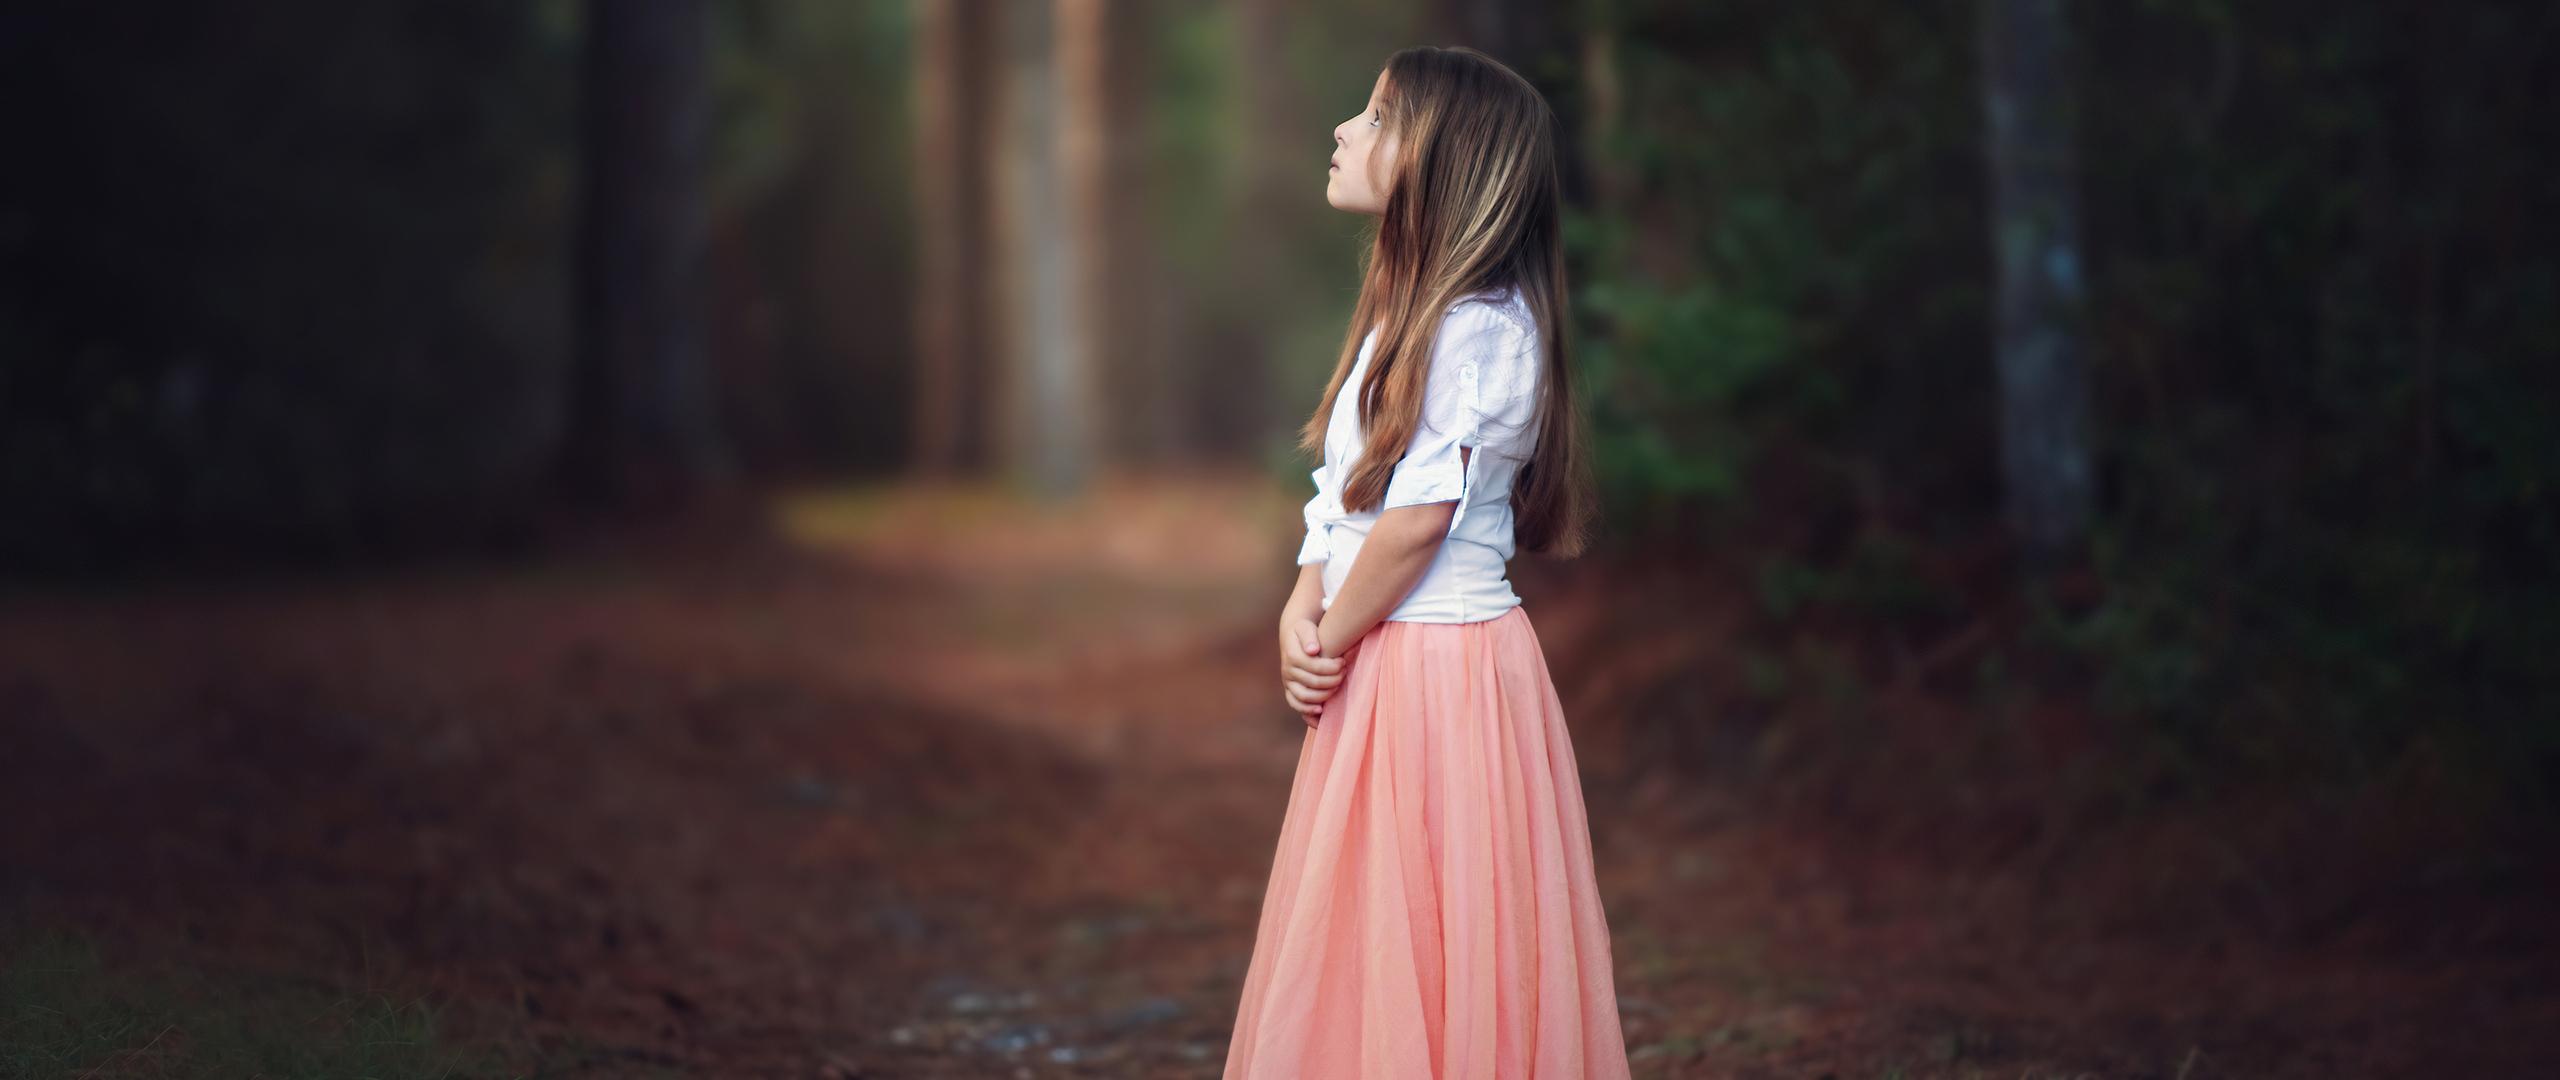 little-girl-looking-at-bird-4k-kb.jpg